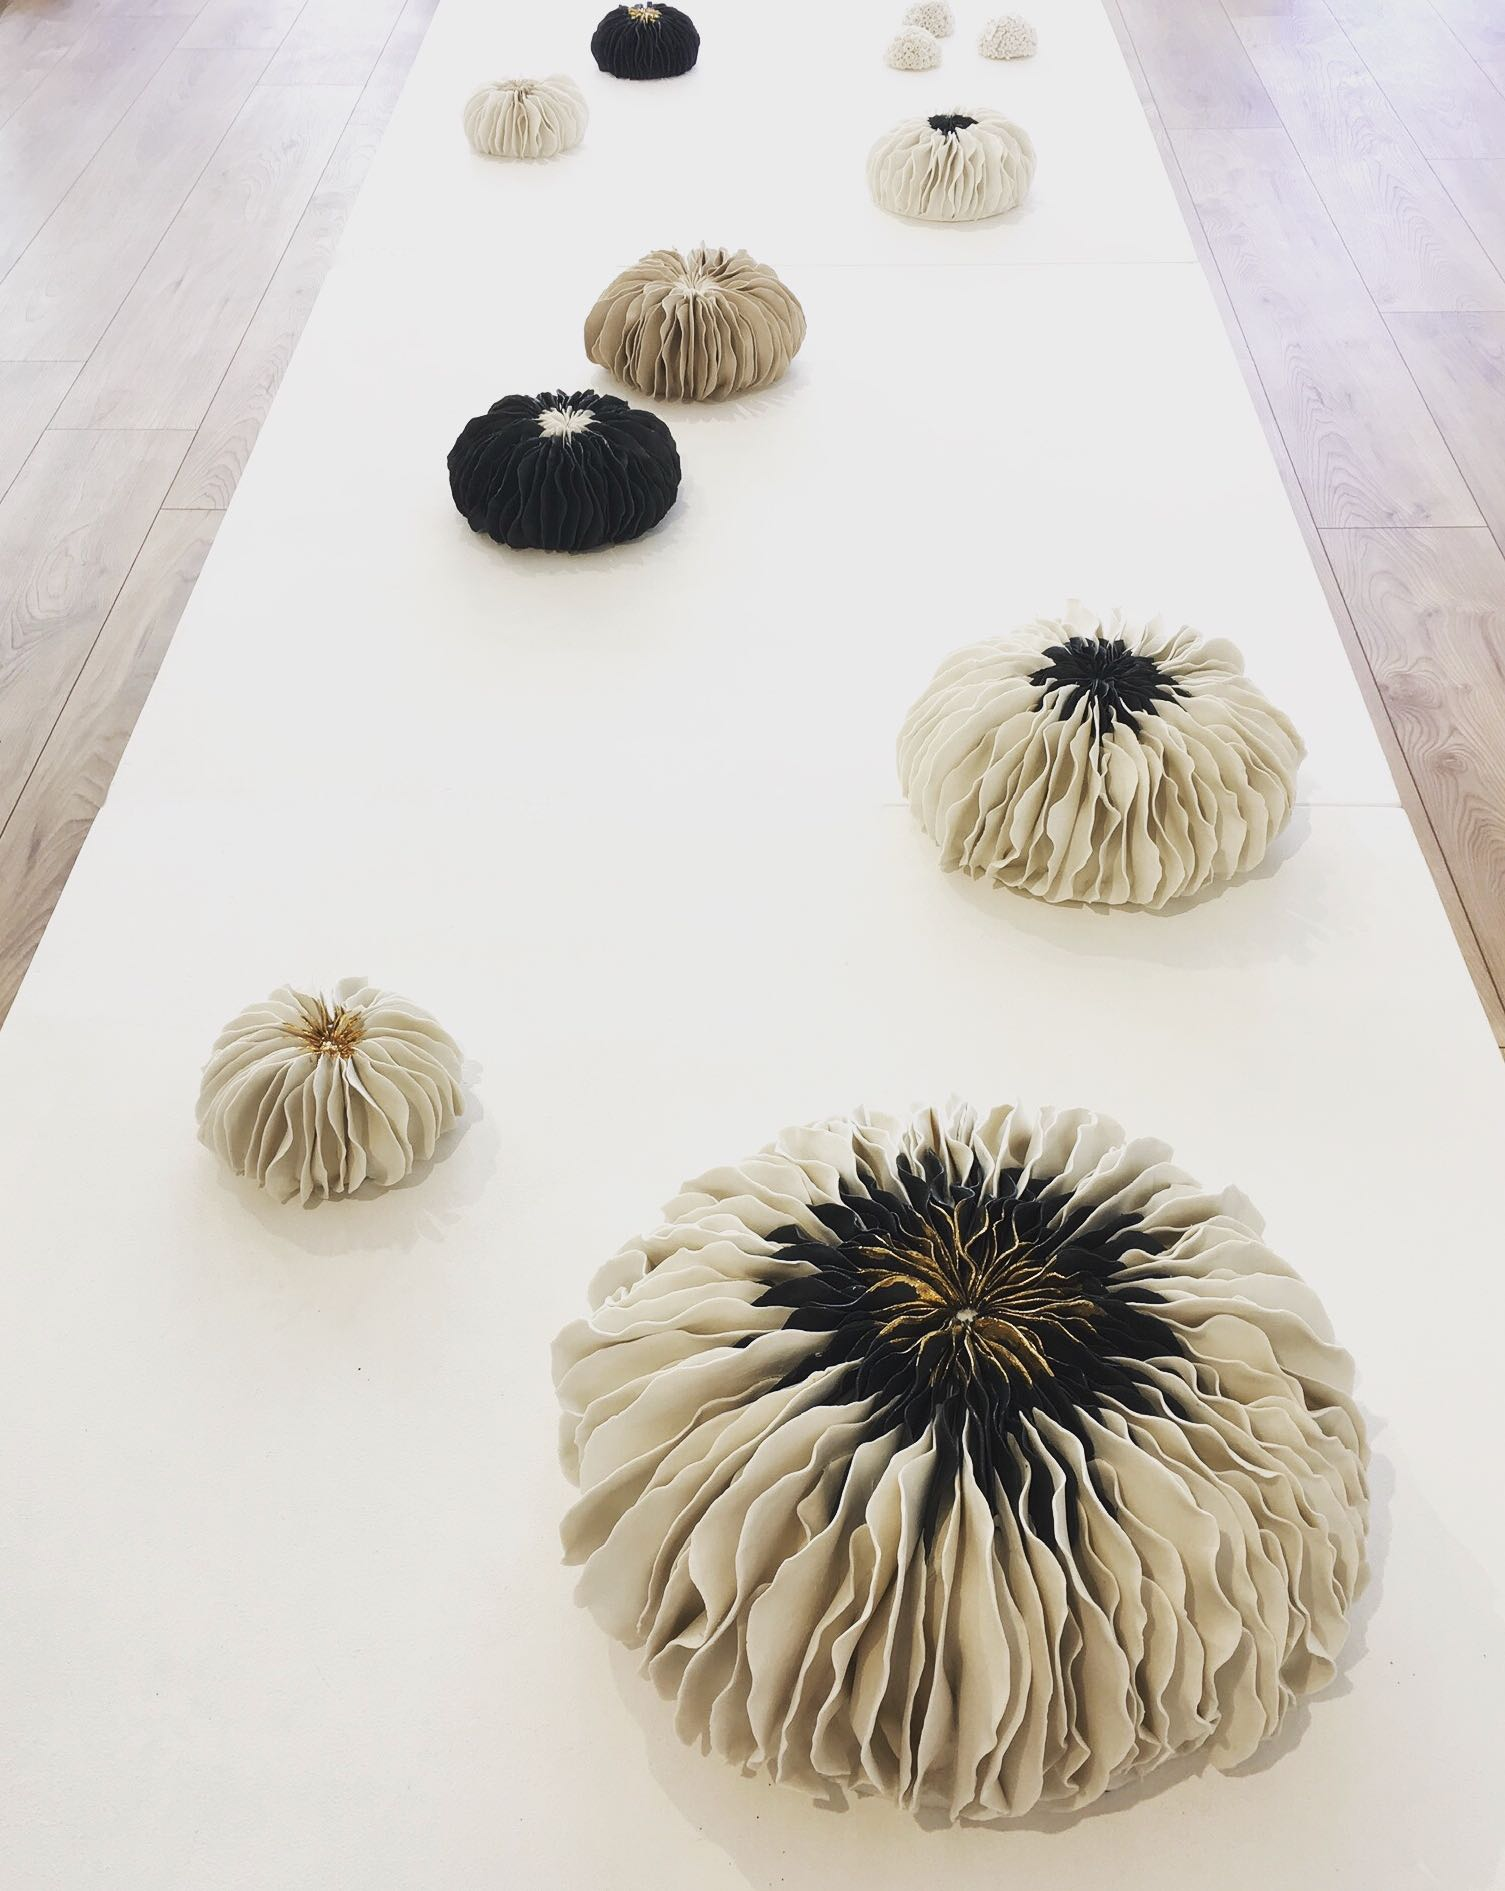 Anémones Dai ceramic à La Station Galerie